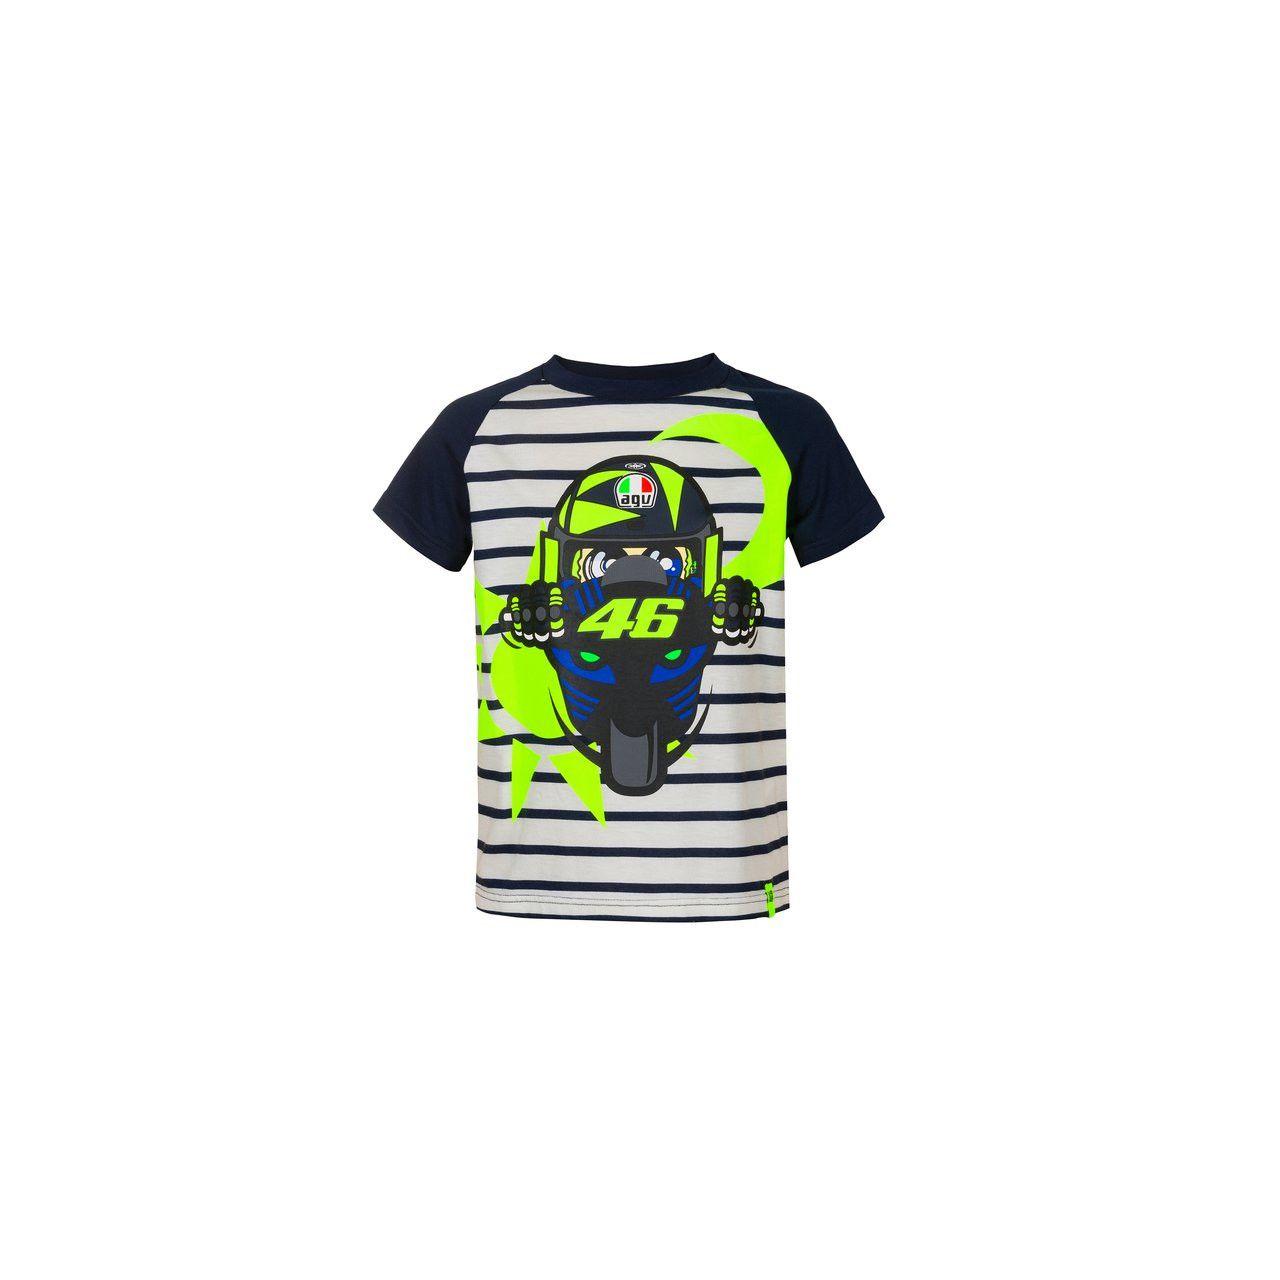 VALENTINO ROSSI T-shirt enfant VR46 2020 Motina